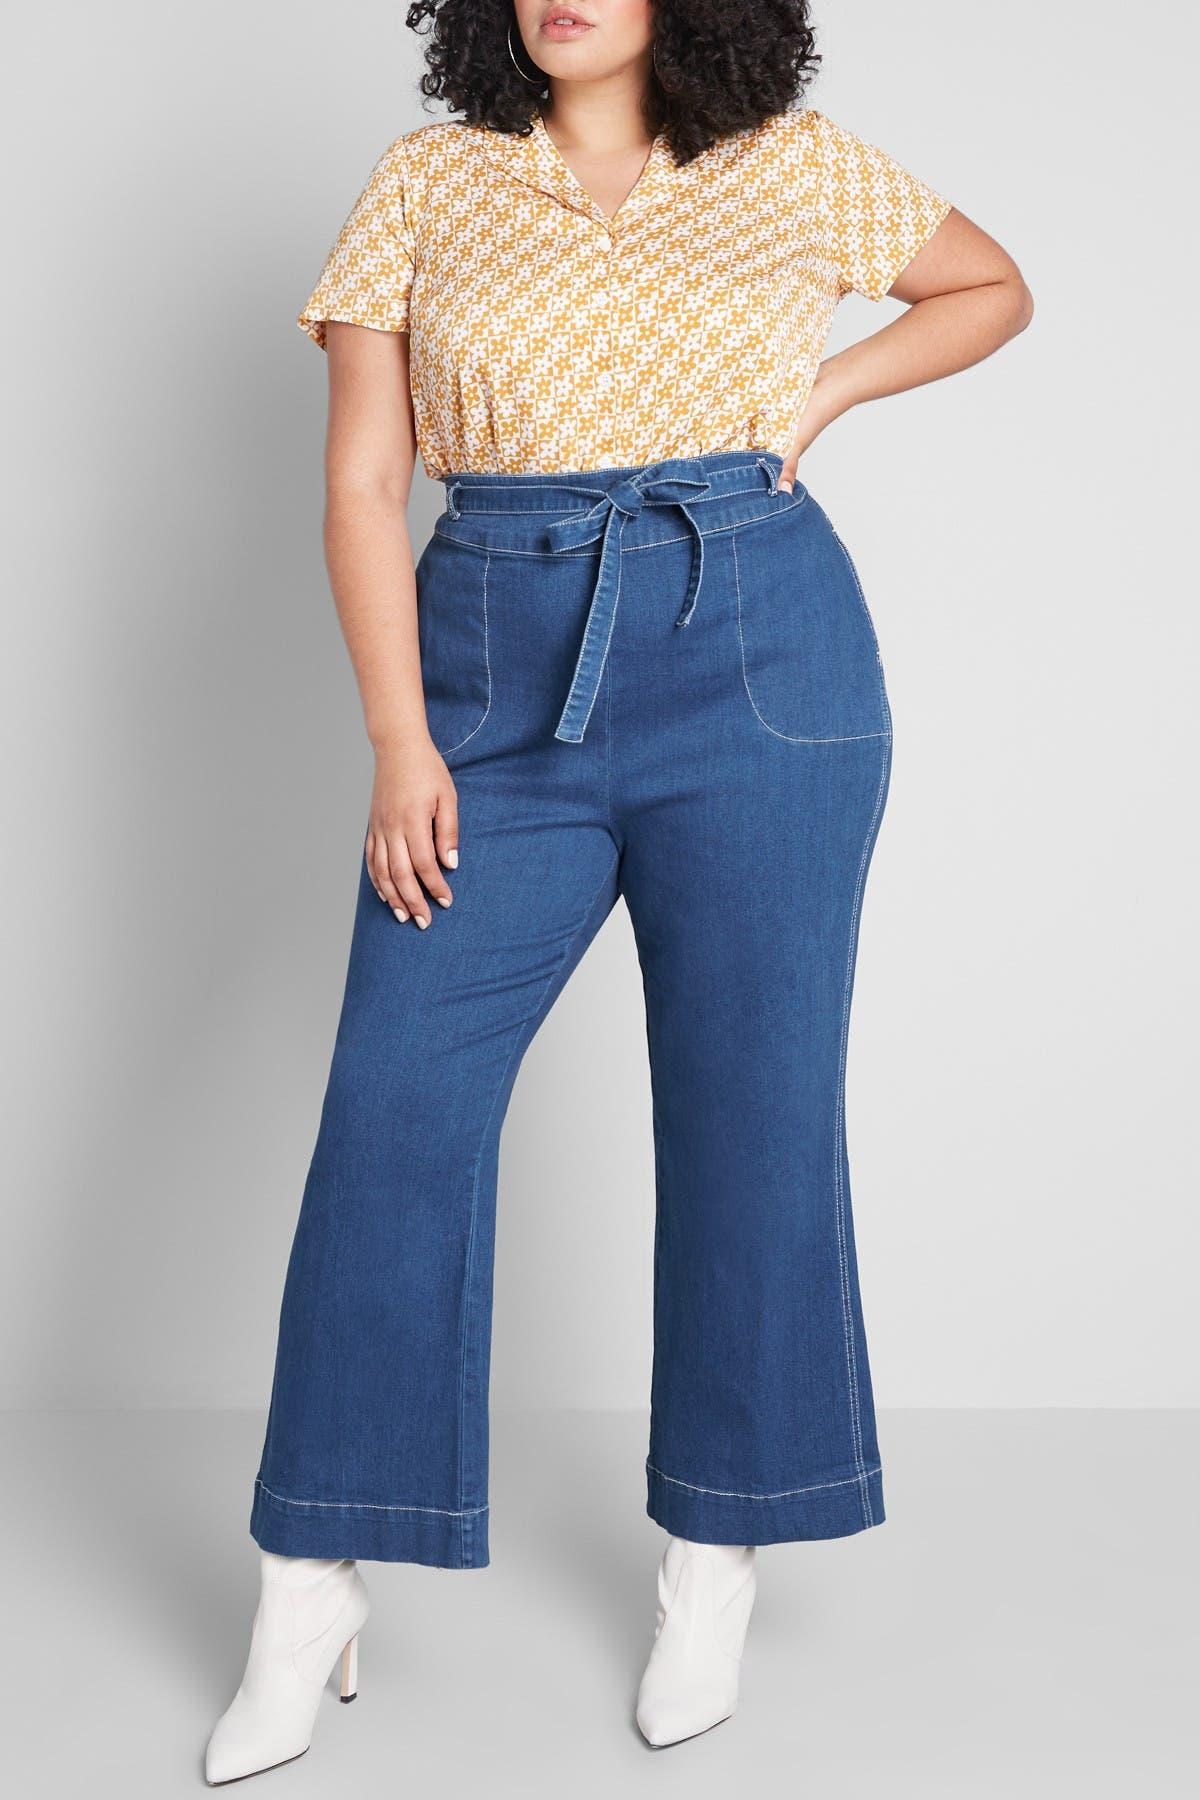 60s Pants, Jeans, Hippie, Flares, Jumpsuits MODCLOTH Denim Daydream Wide Leg Jeans Size 28 - Blue at Nordstrom Rack $28.97 AT vintagedancer.com